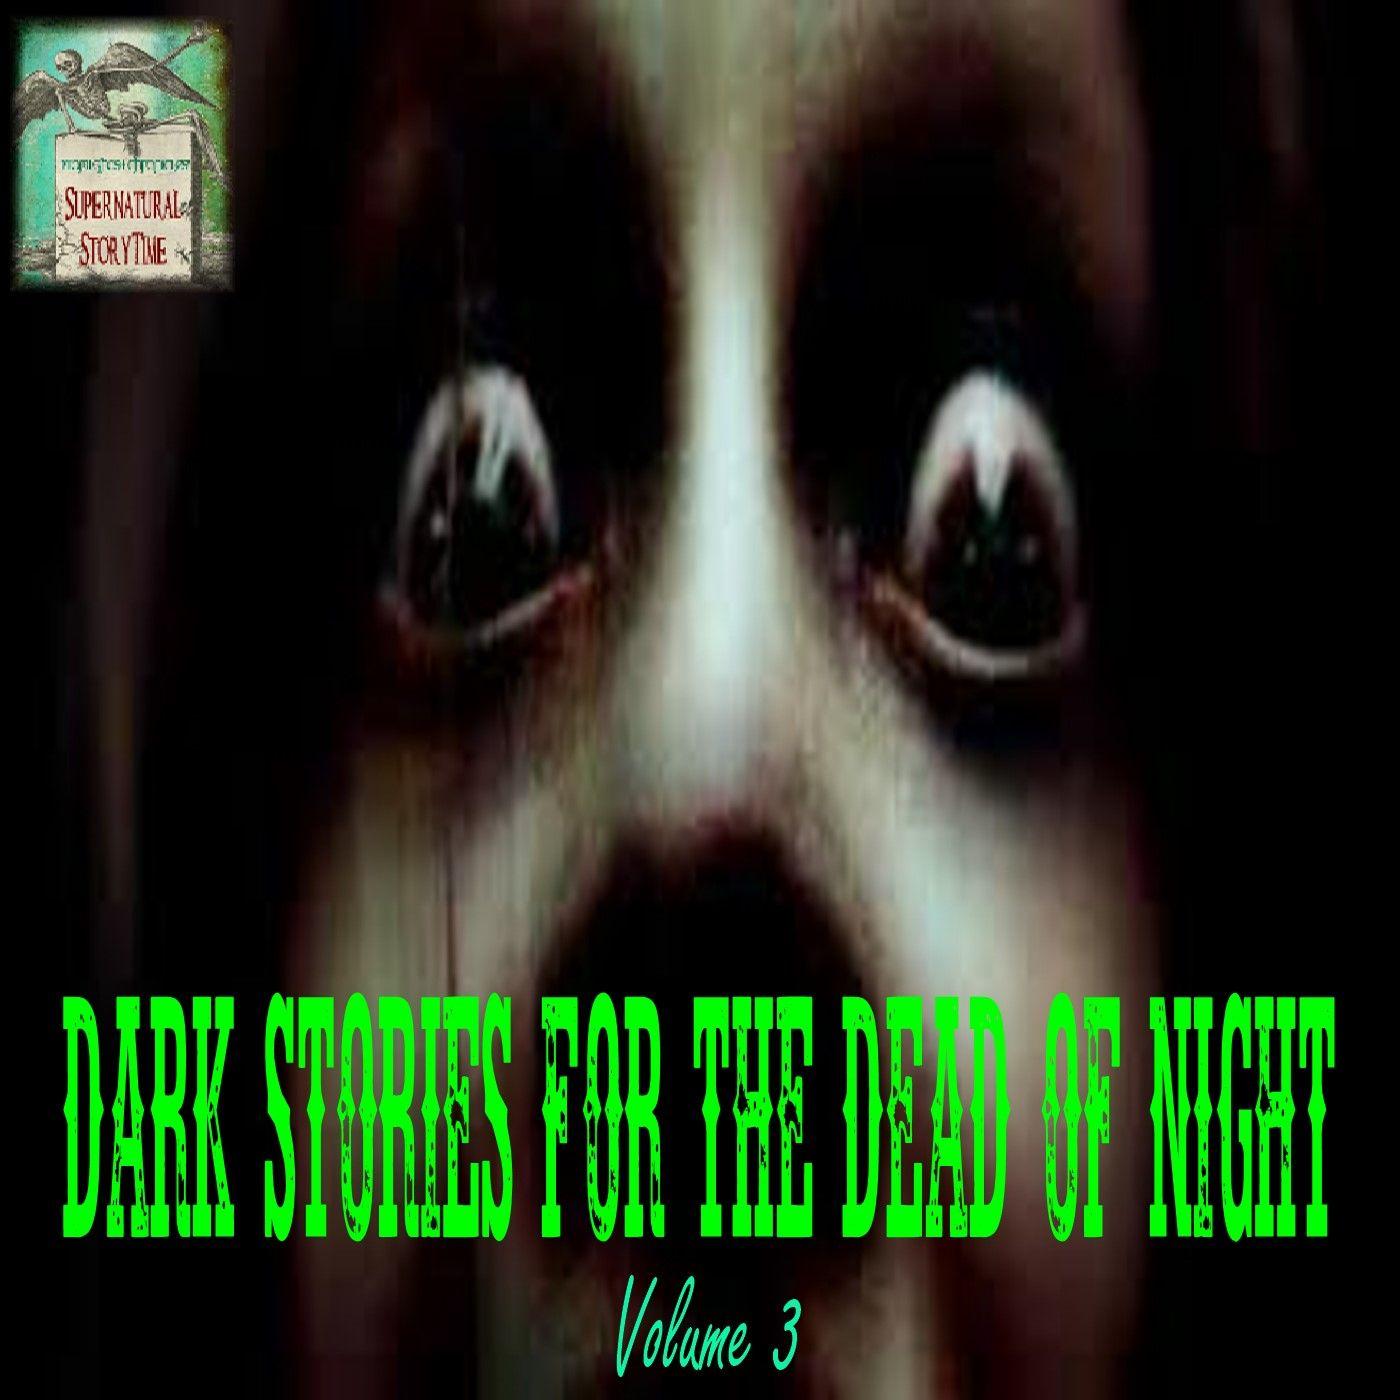 Dark Stories for the Dead of Night | Volume 3 | Podcast E144